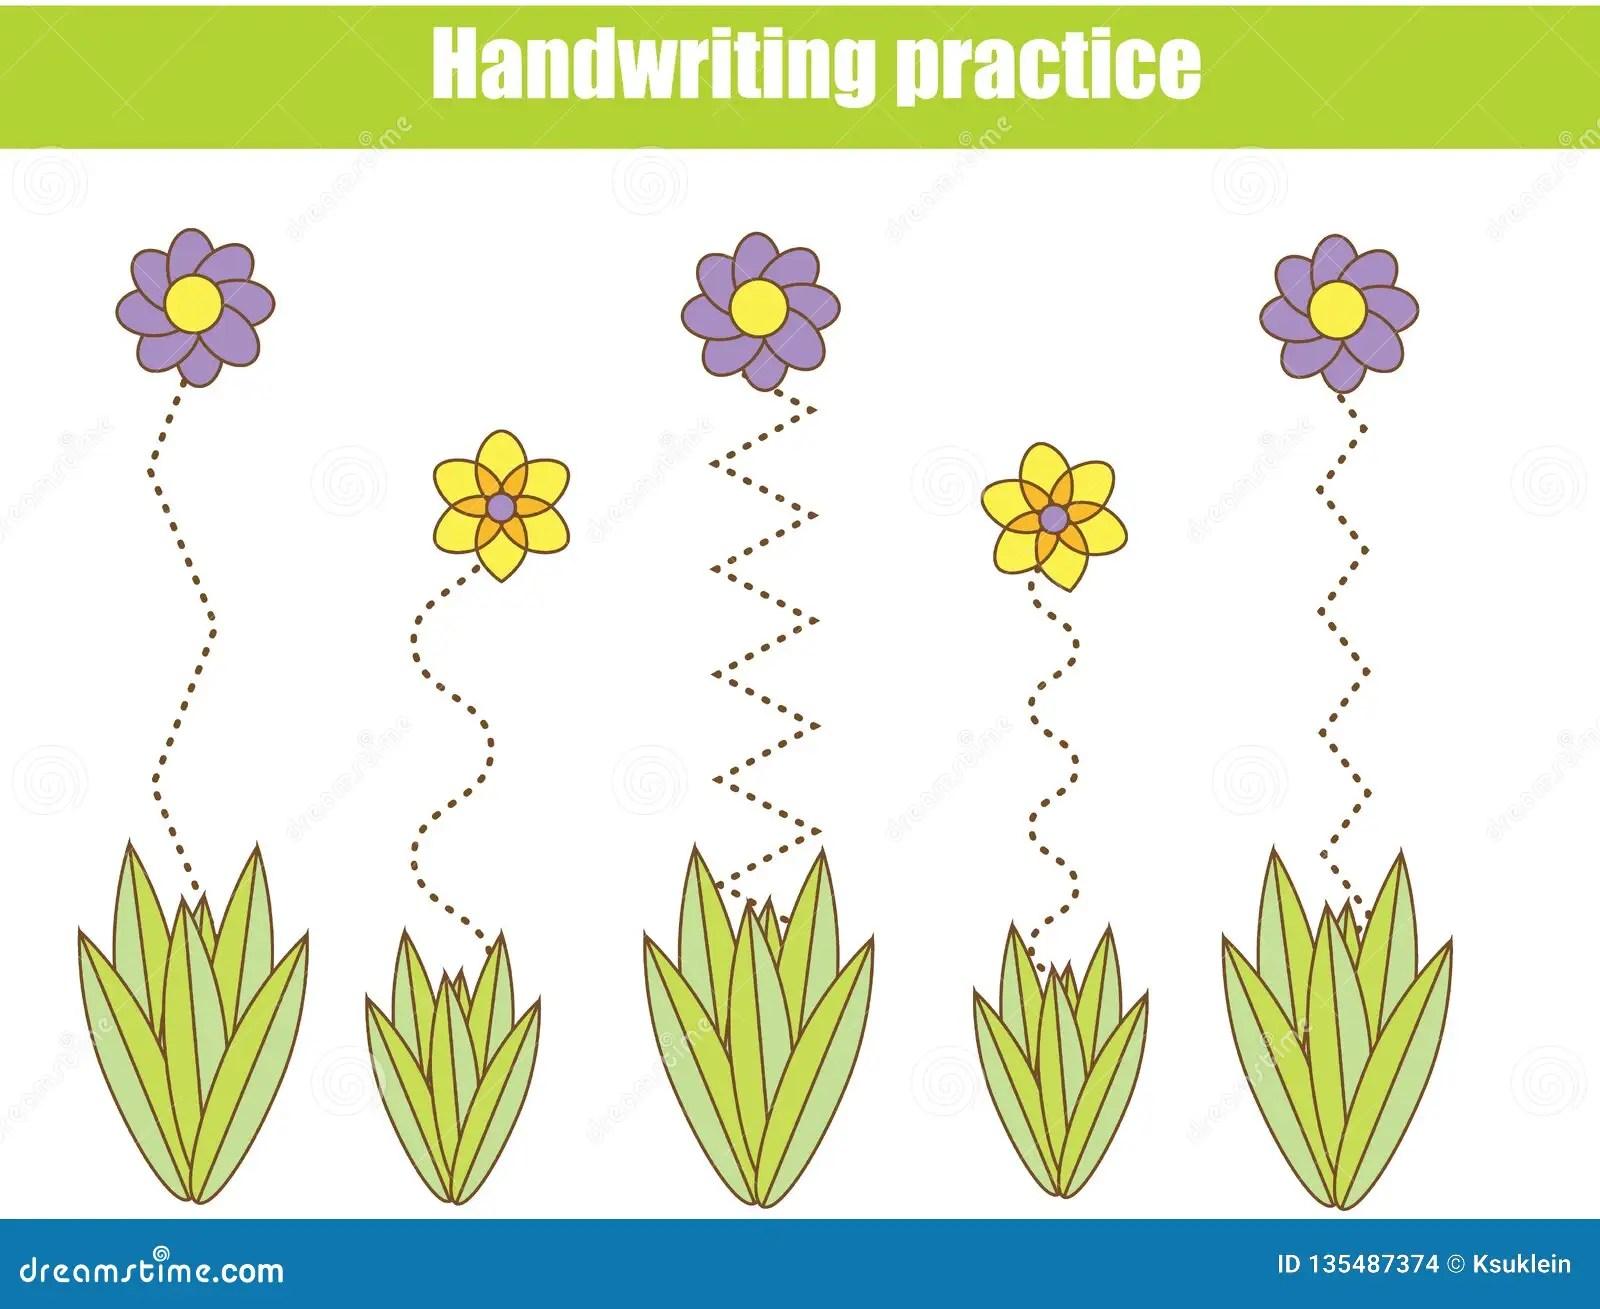 Flower Basics Worksheet Answers